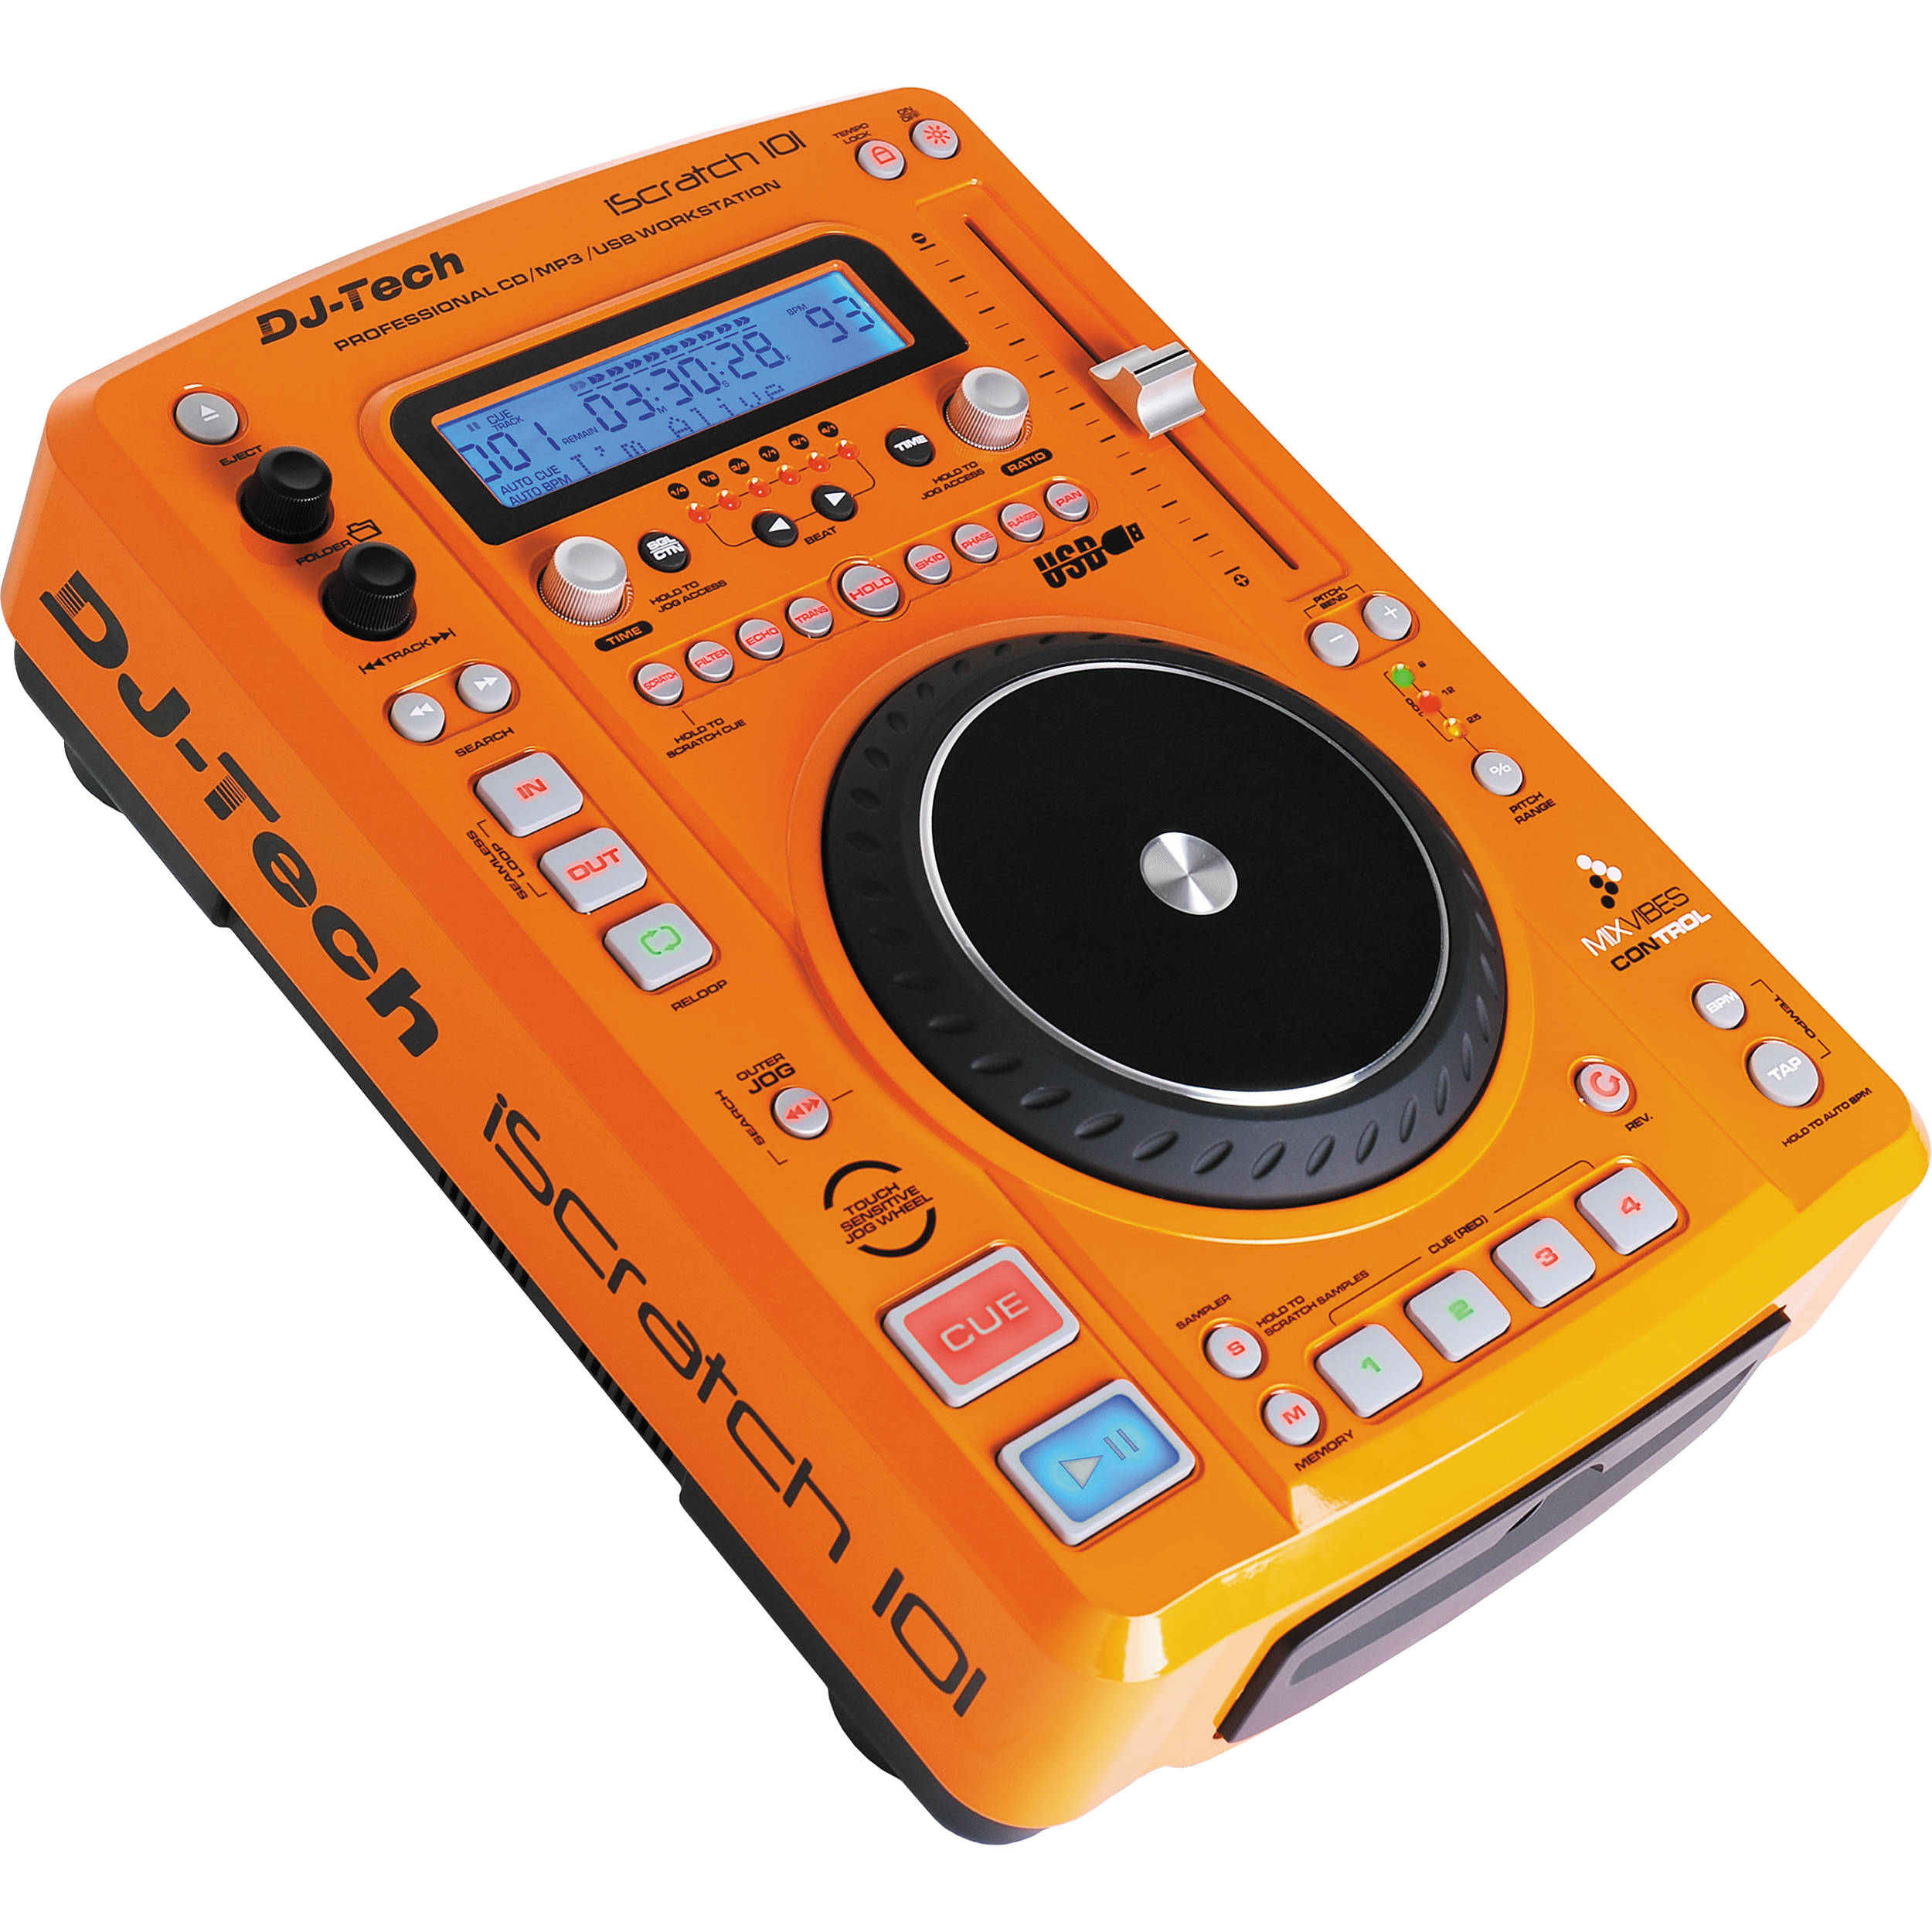 dj tech iscratch 101 dj cd player and usb iscratch 101 orange. Black Bedroom Furniture Sets. Home Design Ideas